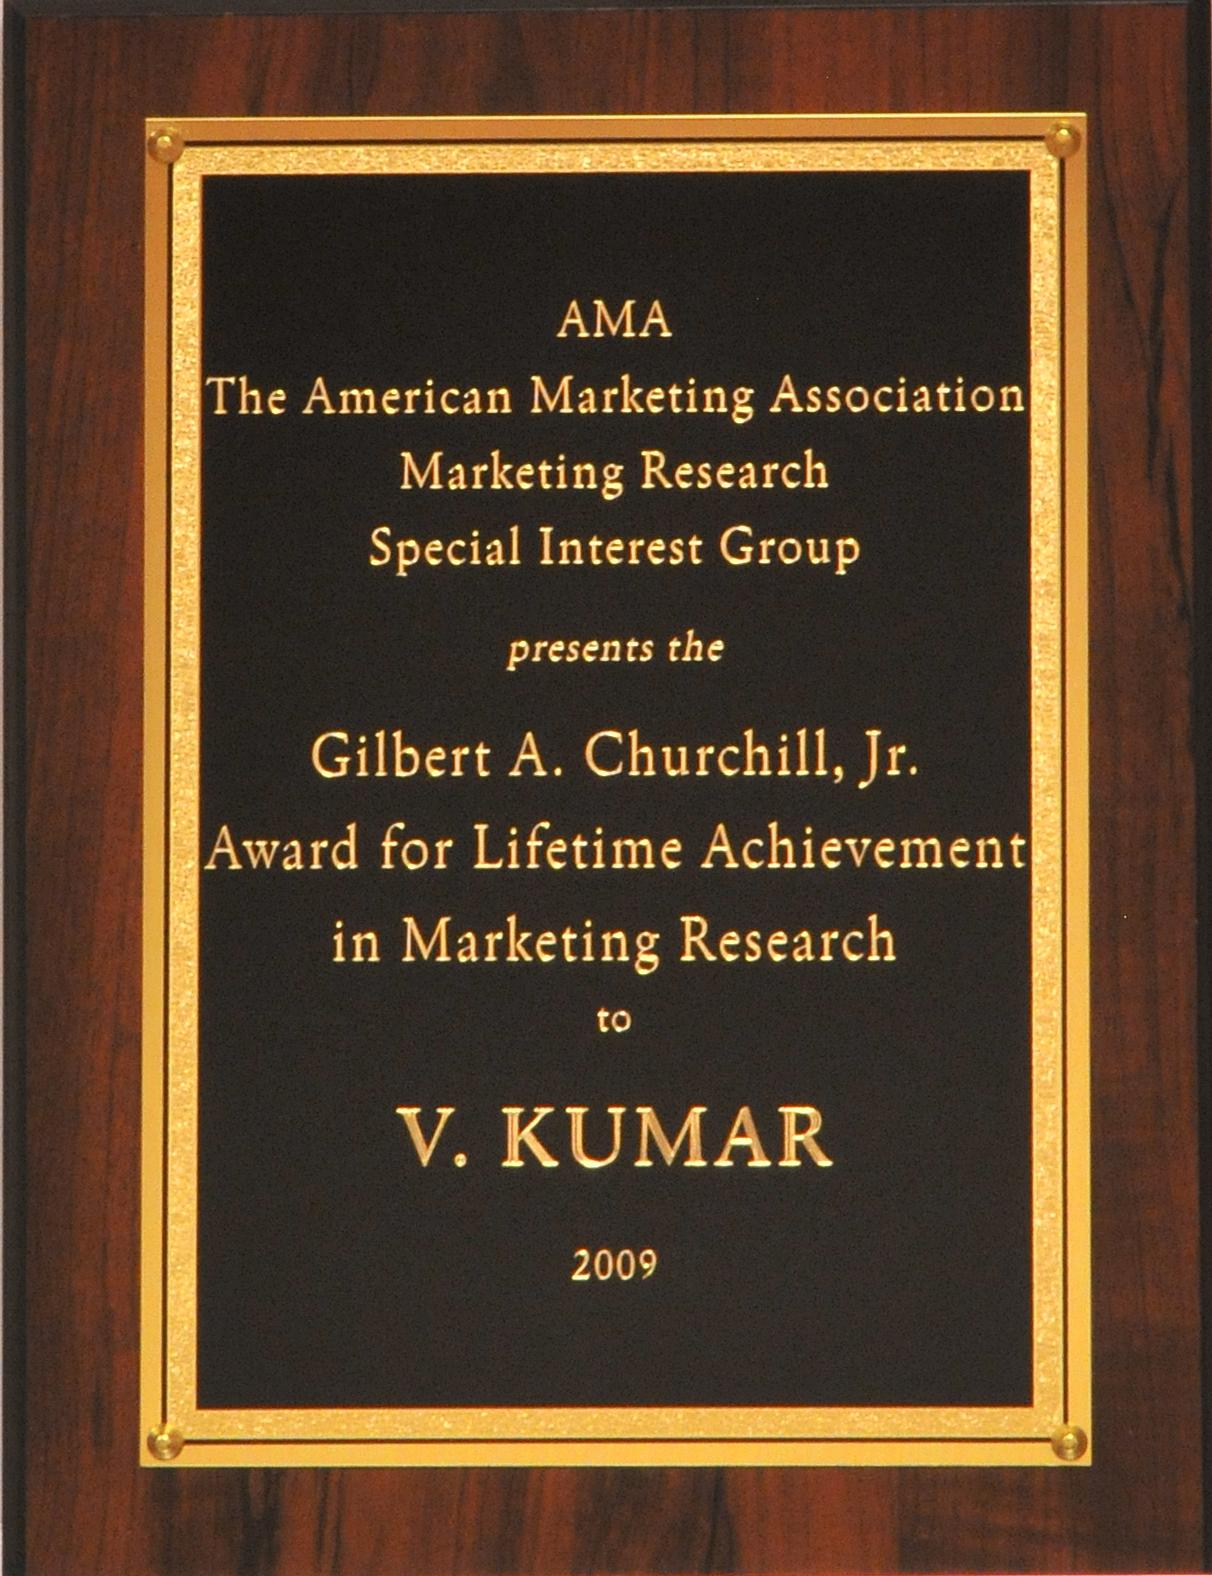 AMA SIG 2009